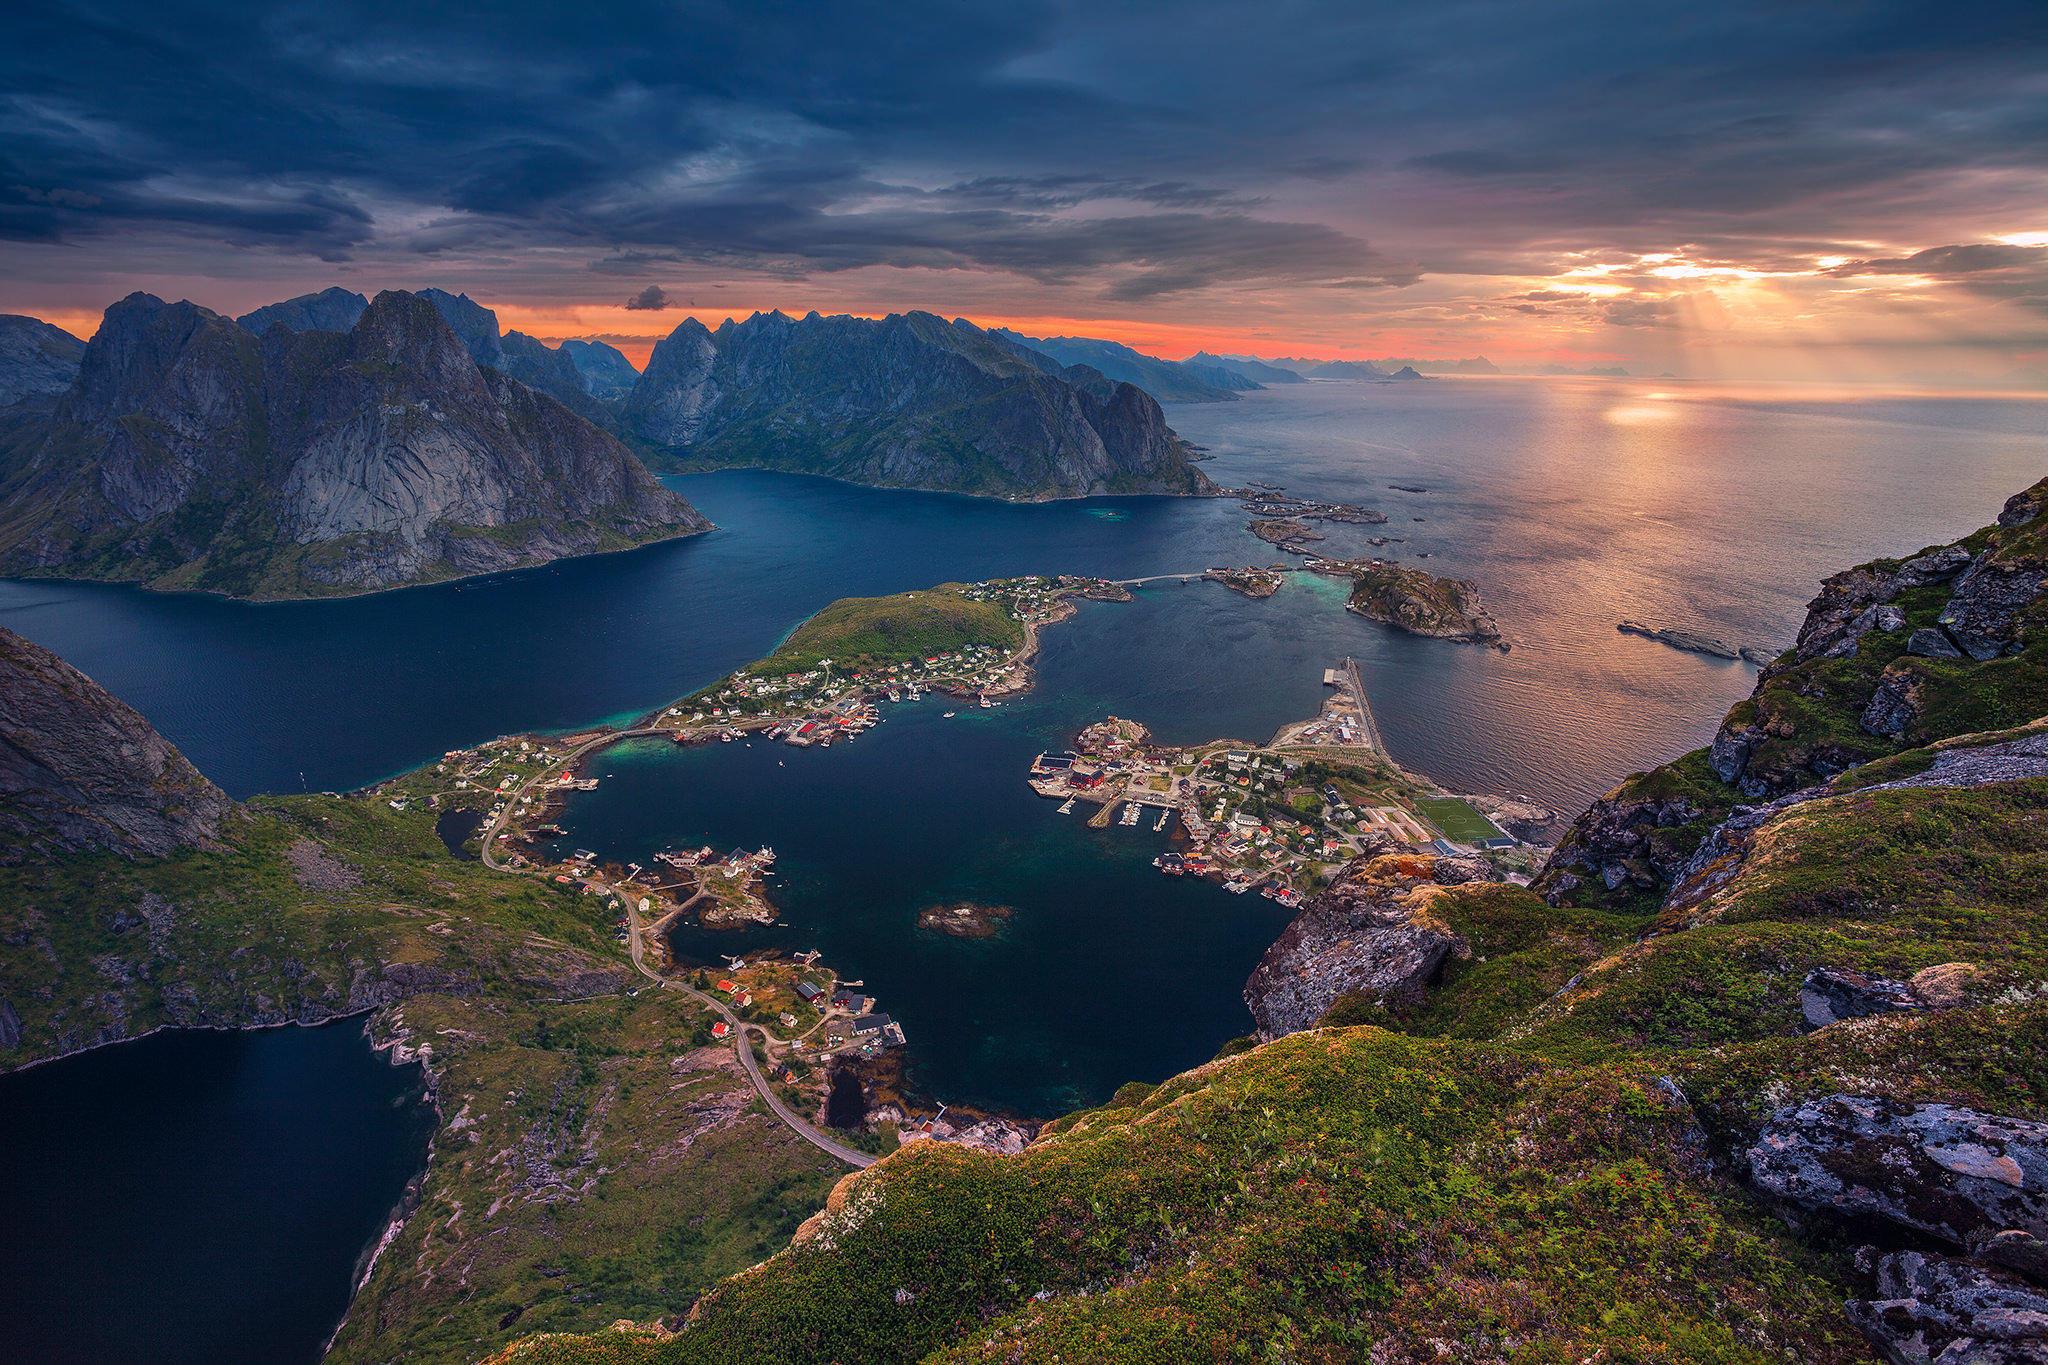 обои Lofoten Islands, Norway, Лофотенские острова, Норвегия картинки фото